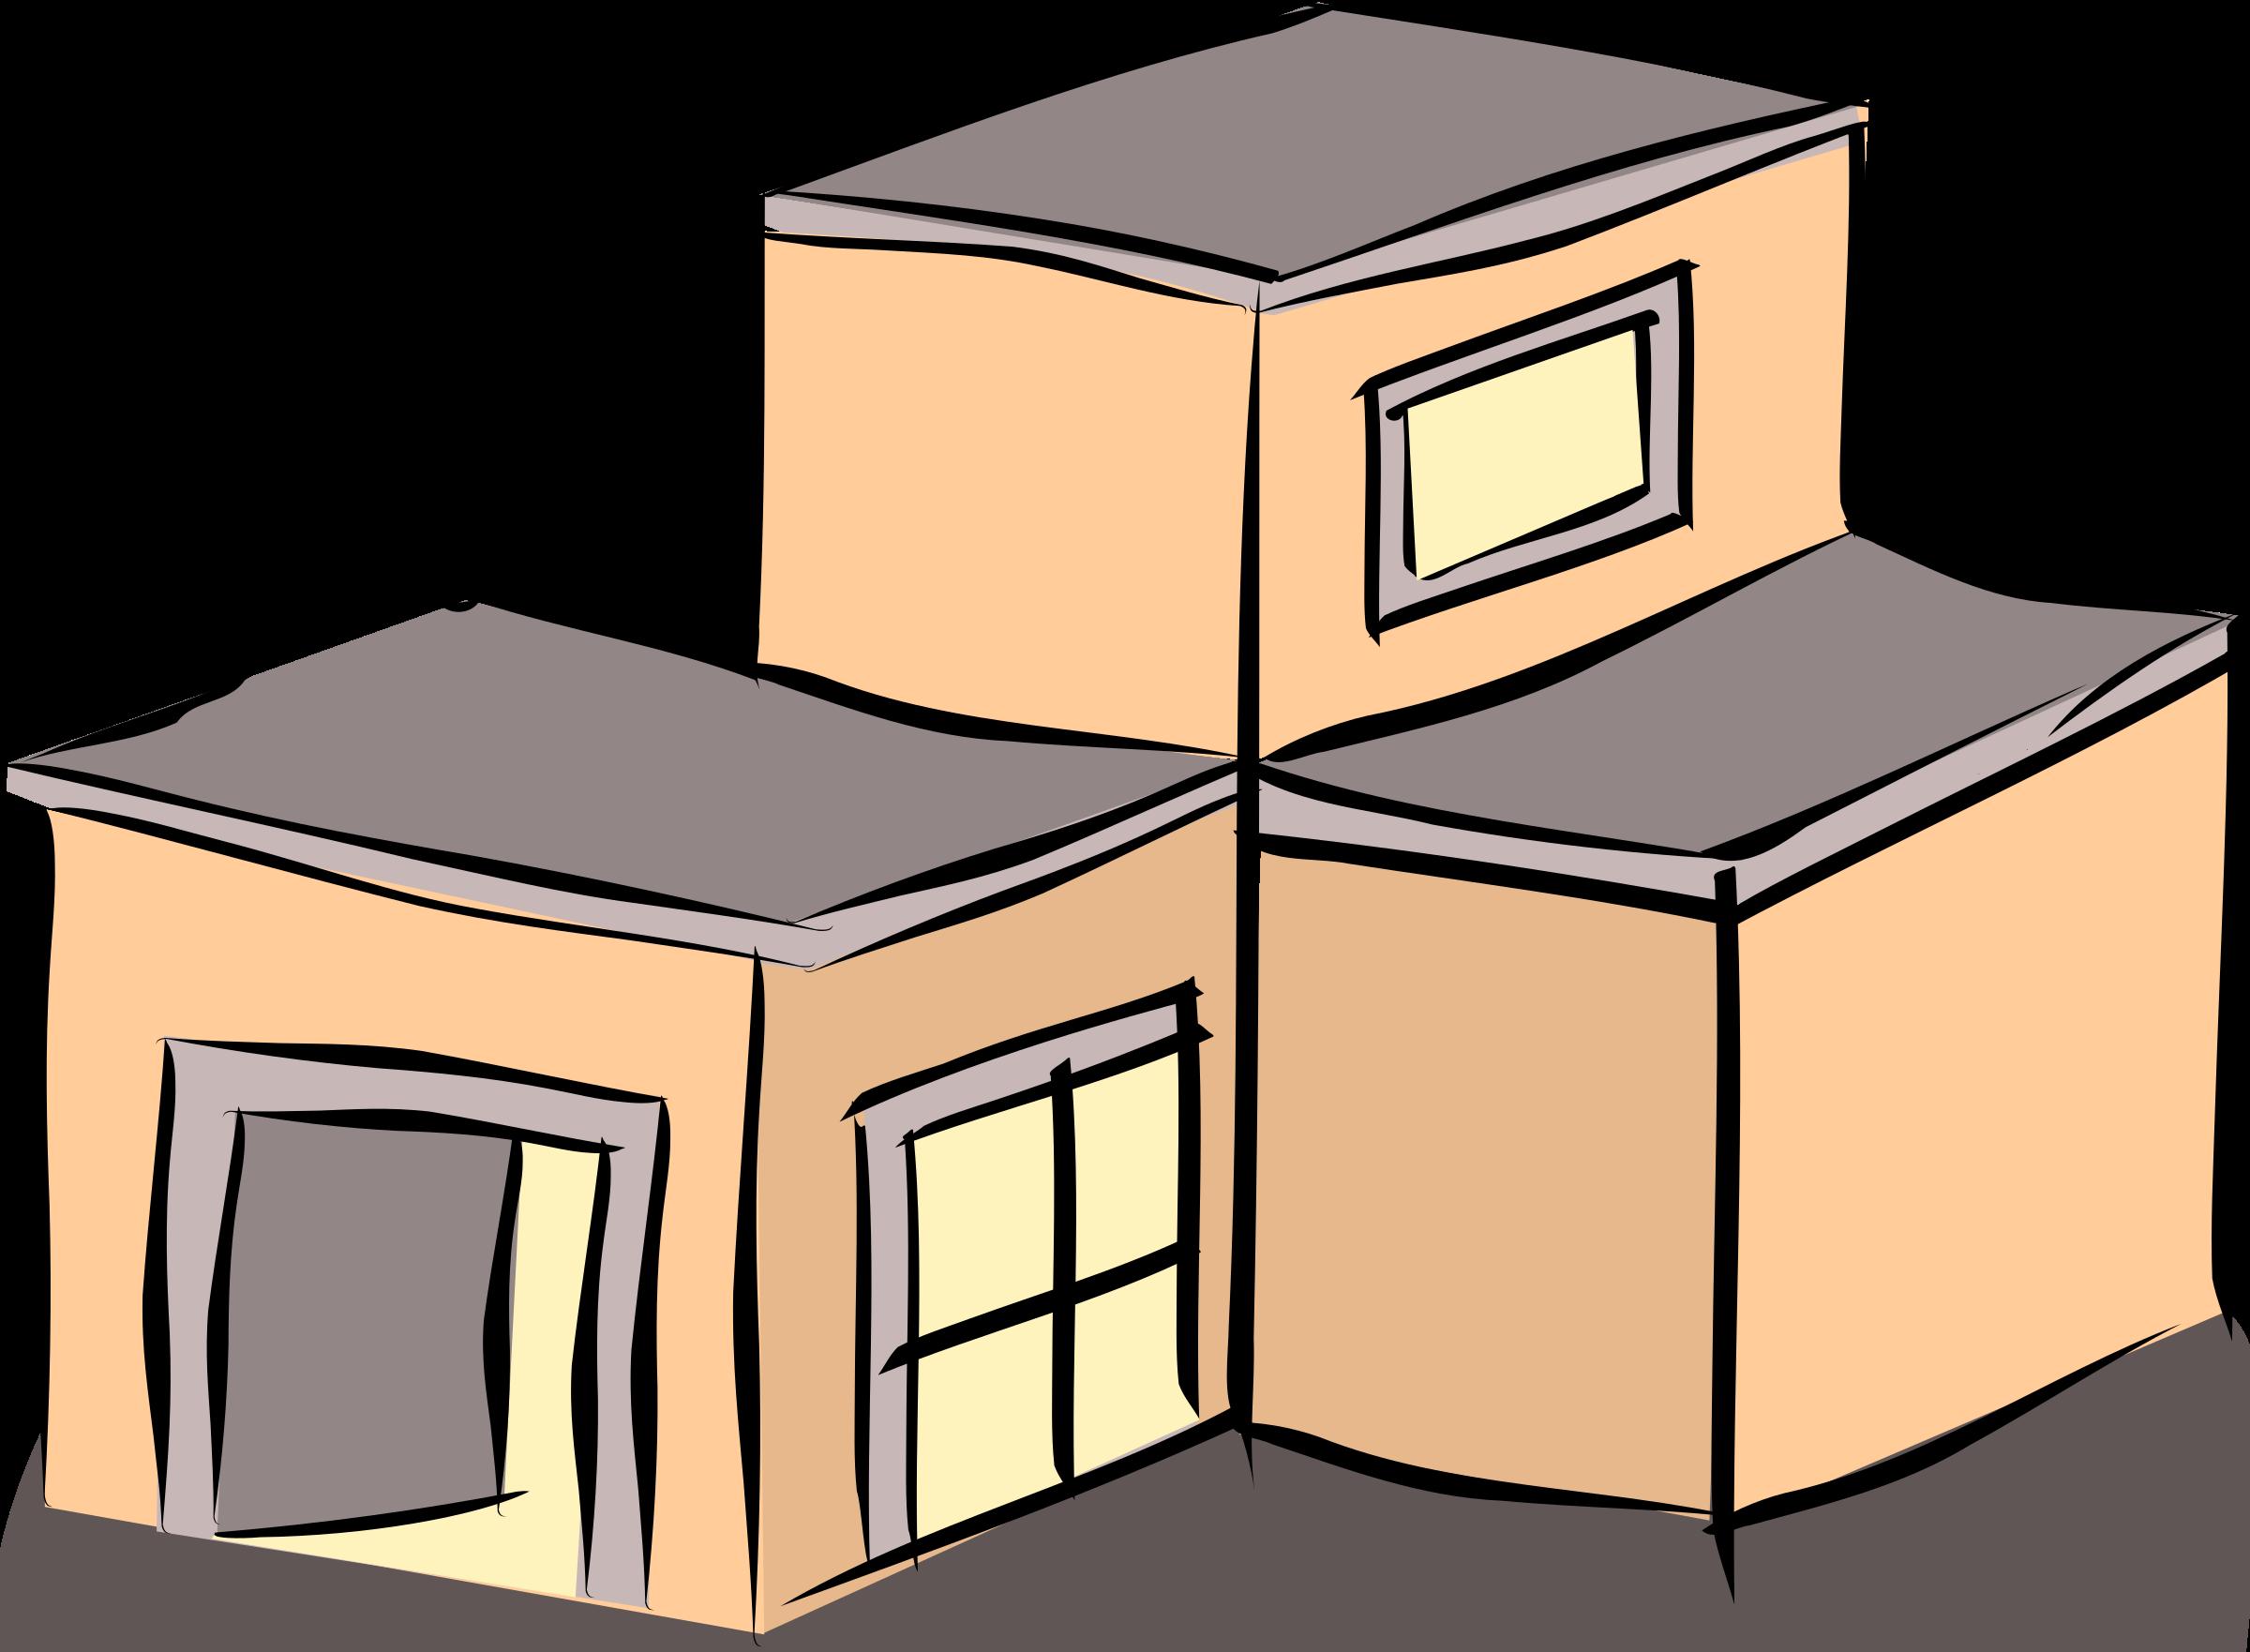 Building house clipart jpg freeuse stock Clipart - Salmon coloured building jpg freeuse stock